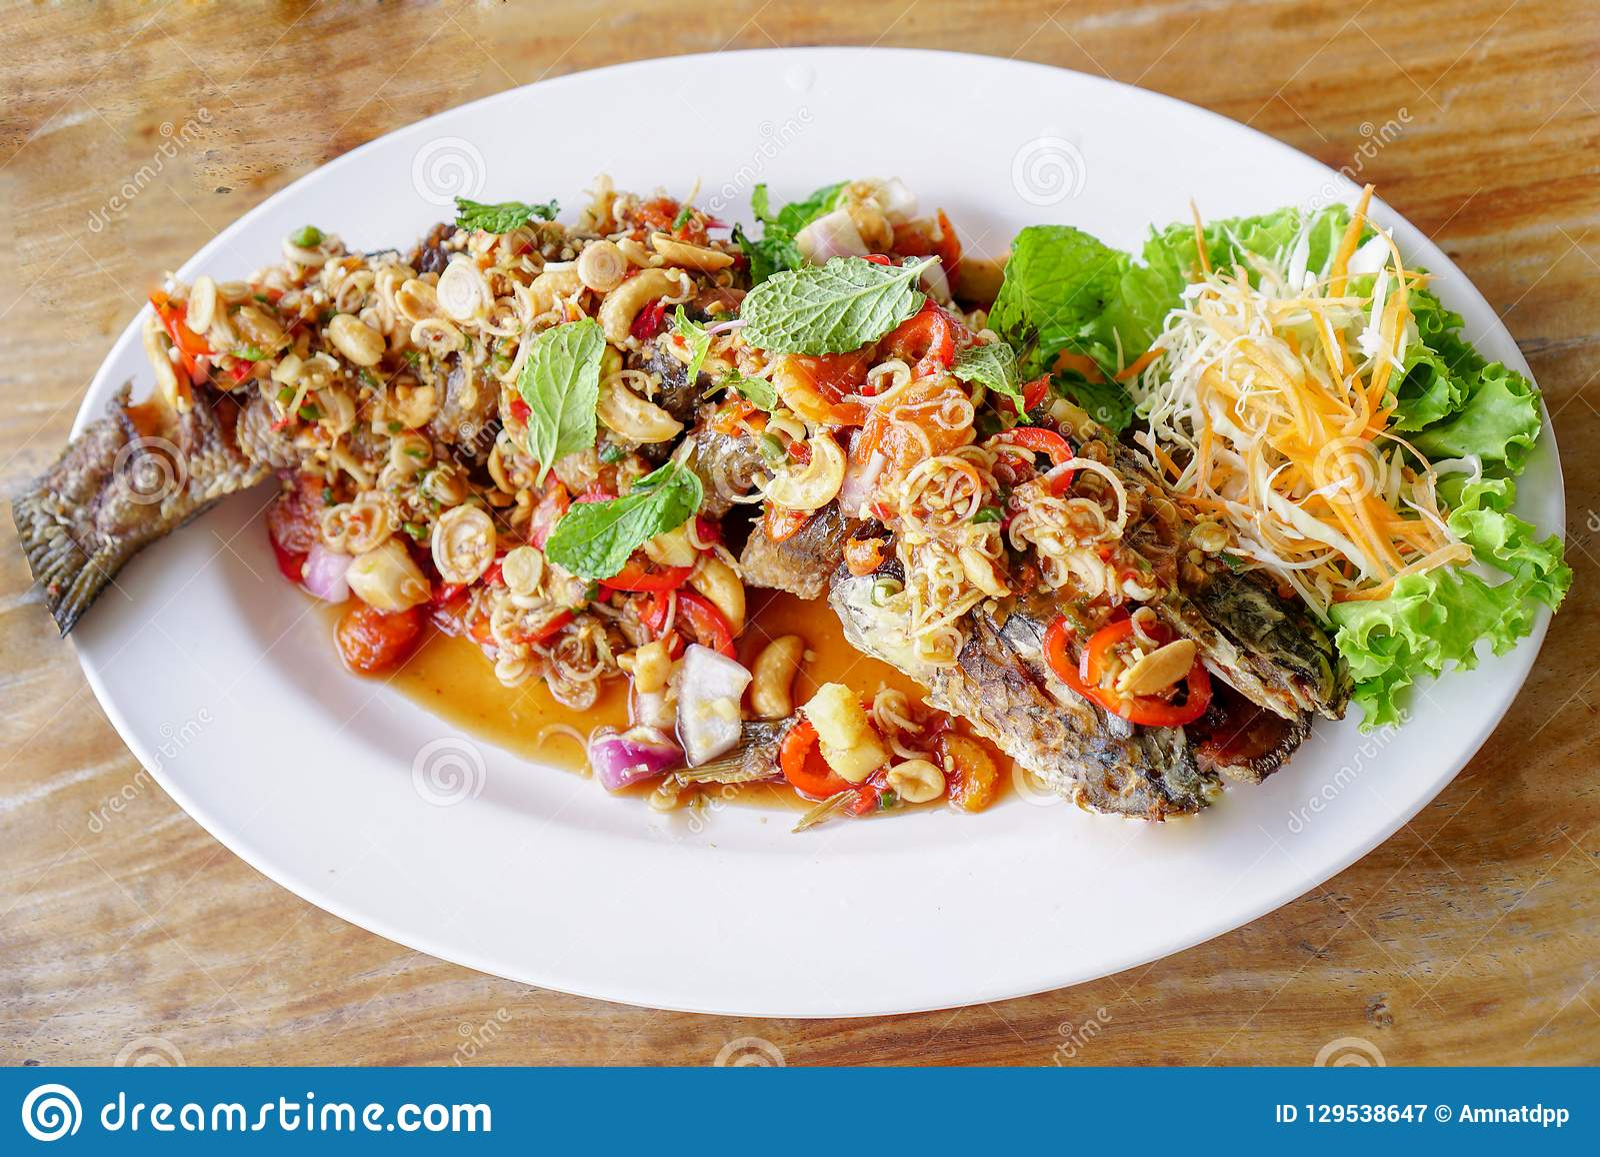 Thai Food,Snakehead fish on a white plate